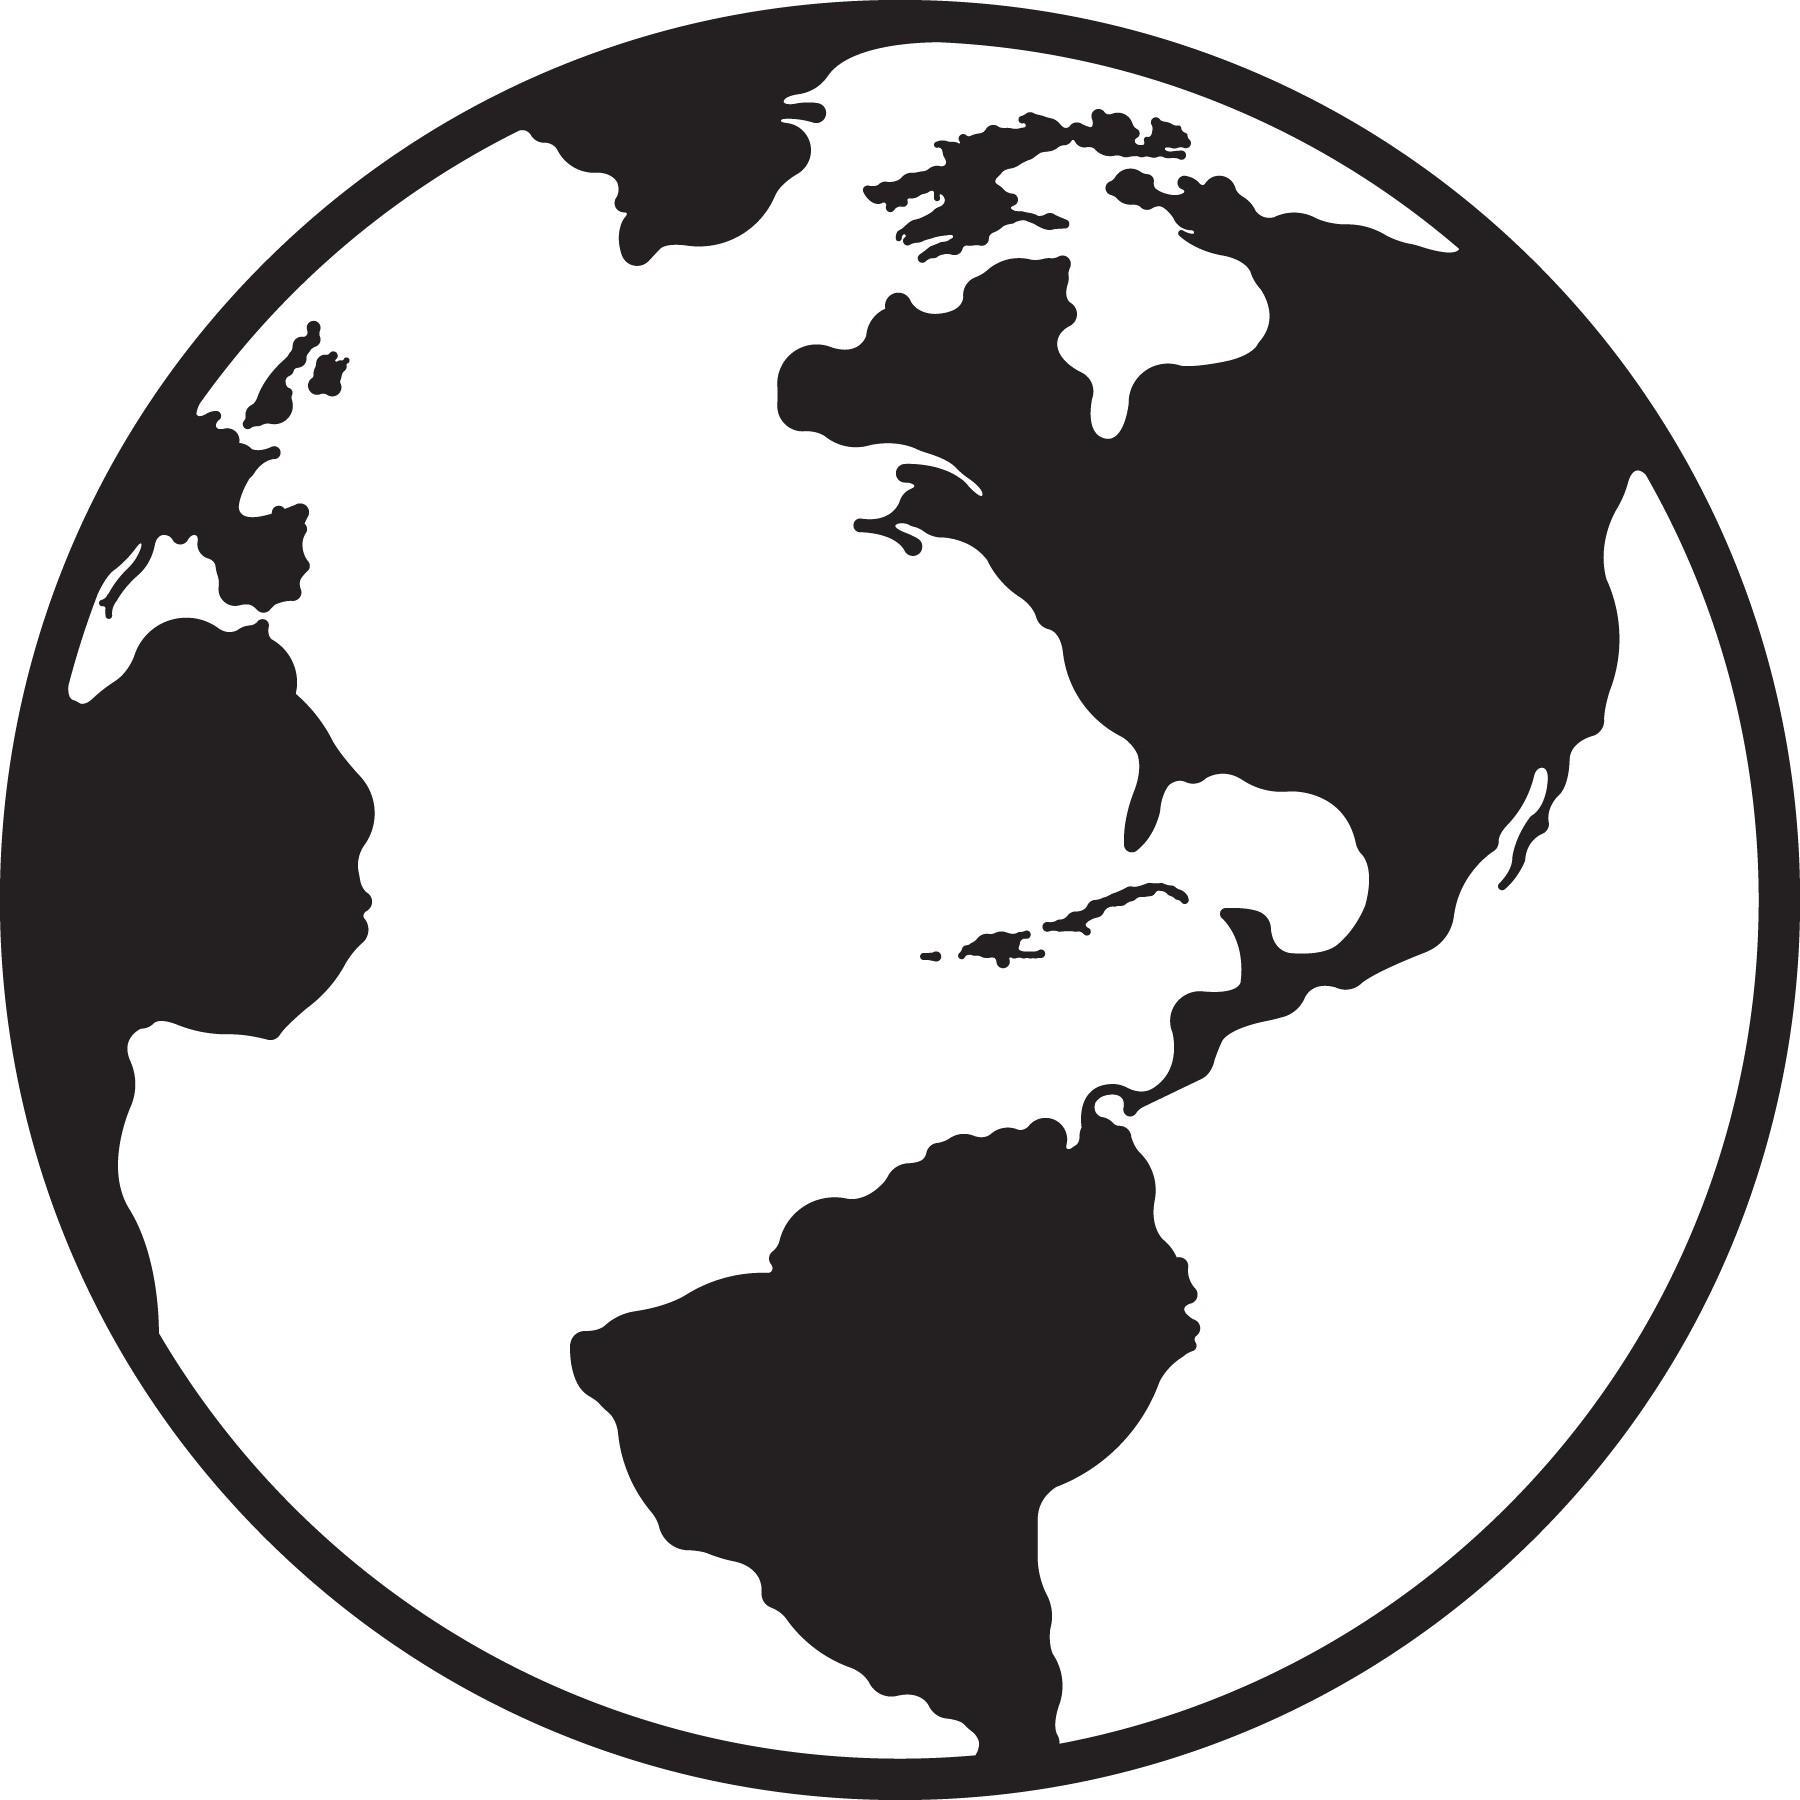 Best Vector Globe Clip Art Drawing » Free Vector Art, Images.